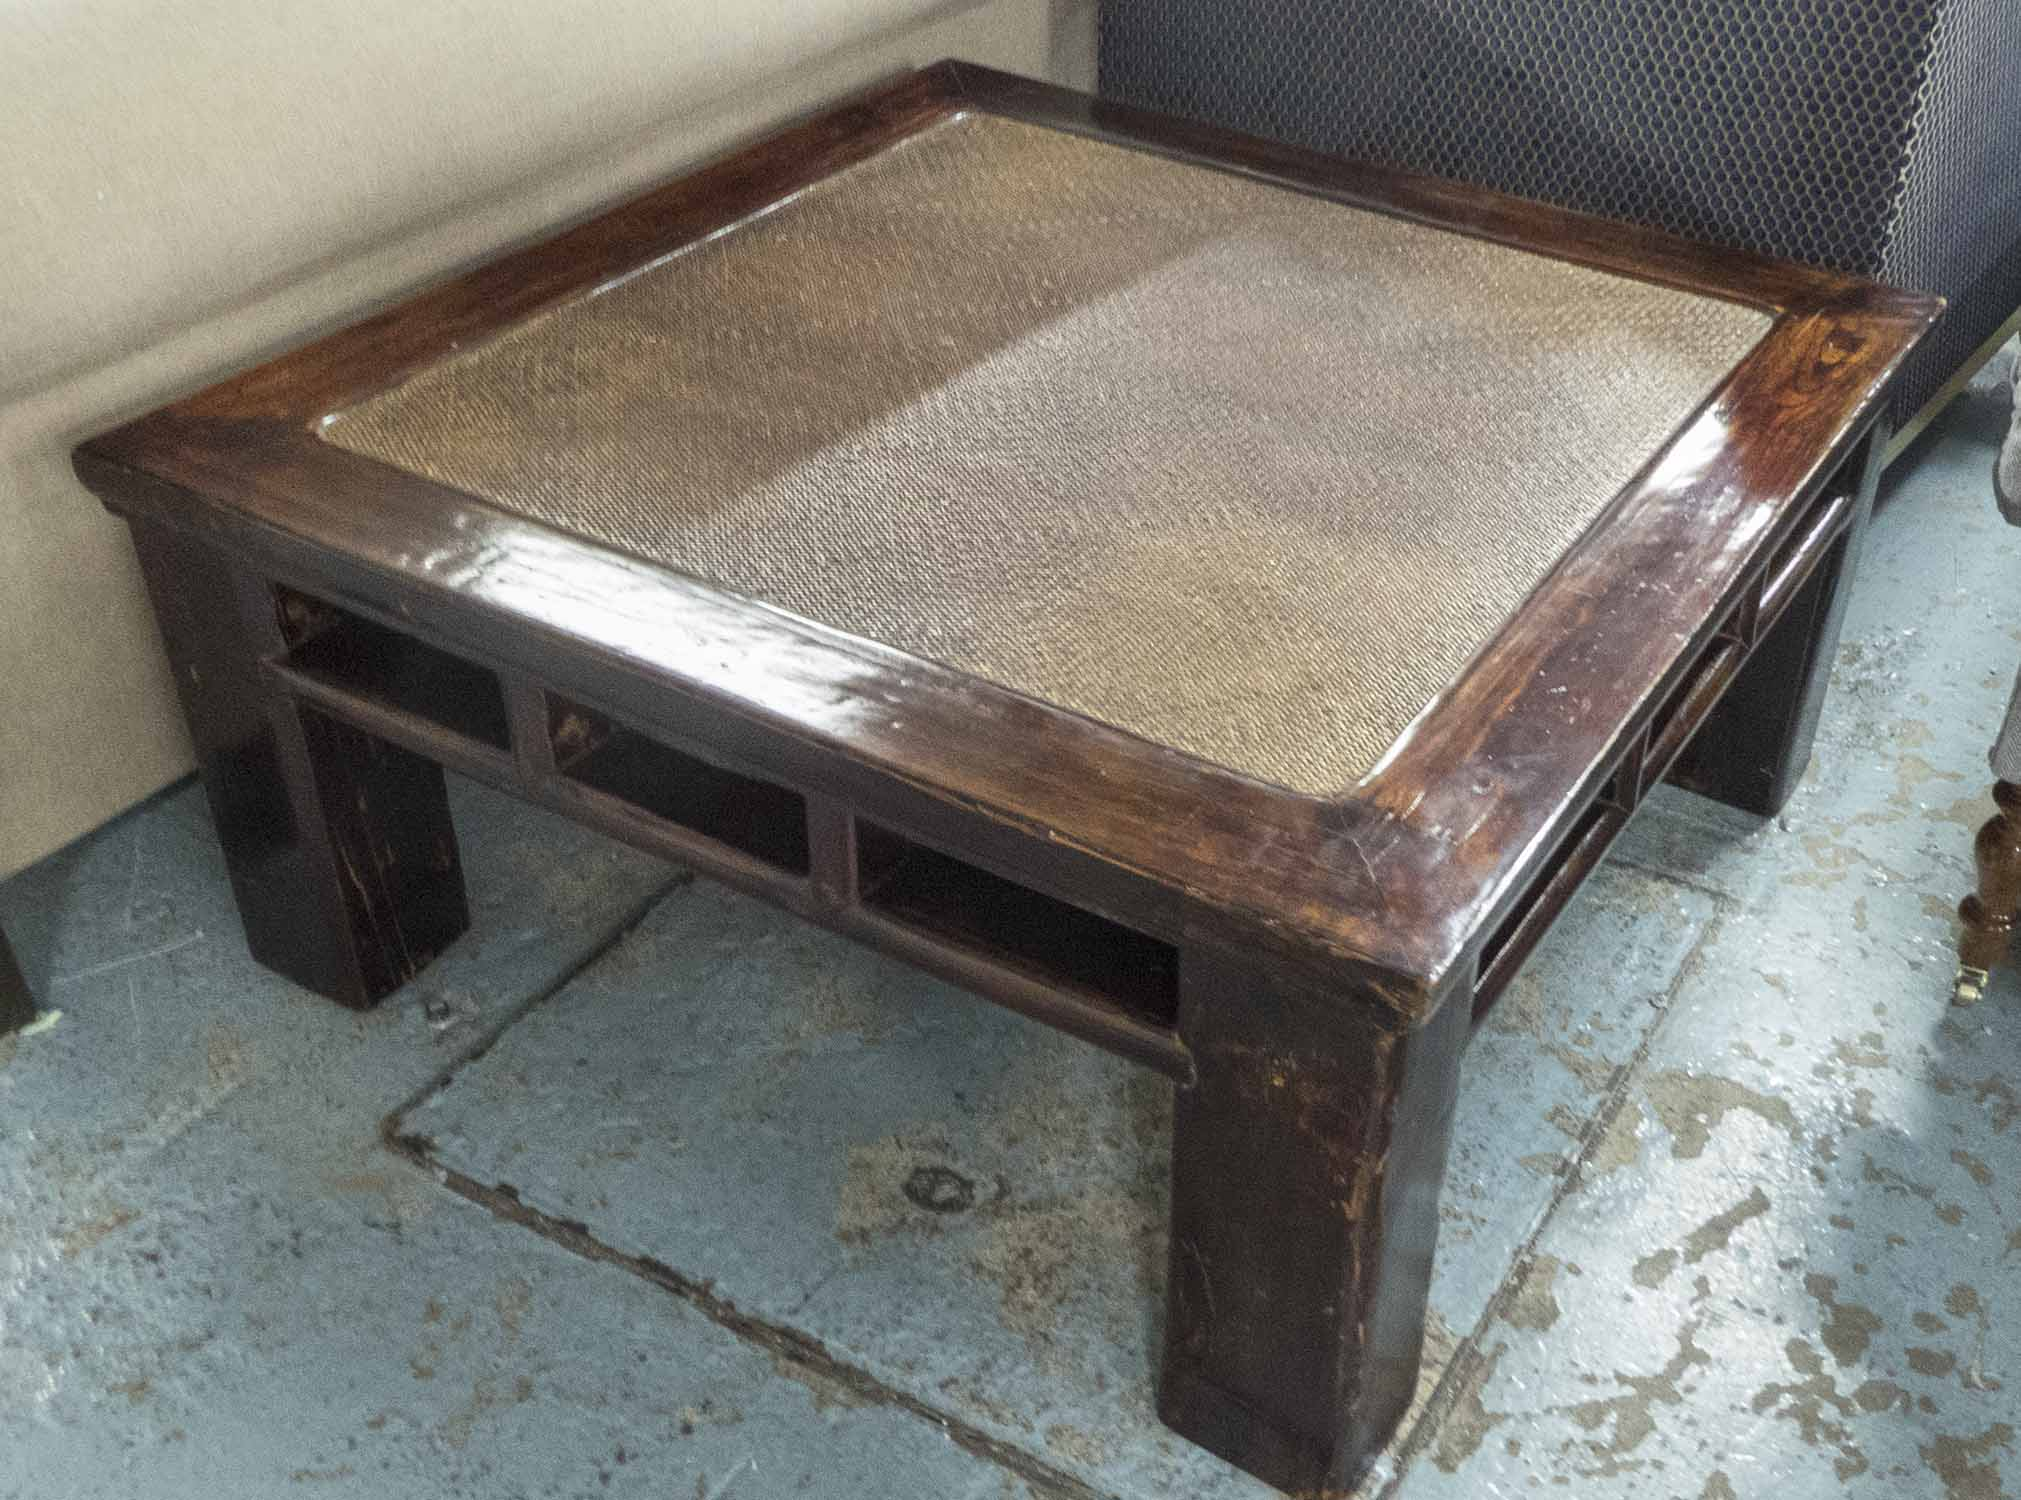 Lot 34 - COFFEE TABLE, square, asian hardwood, woven top, 100cm W x 100cm D x 47cm H.